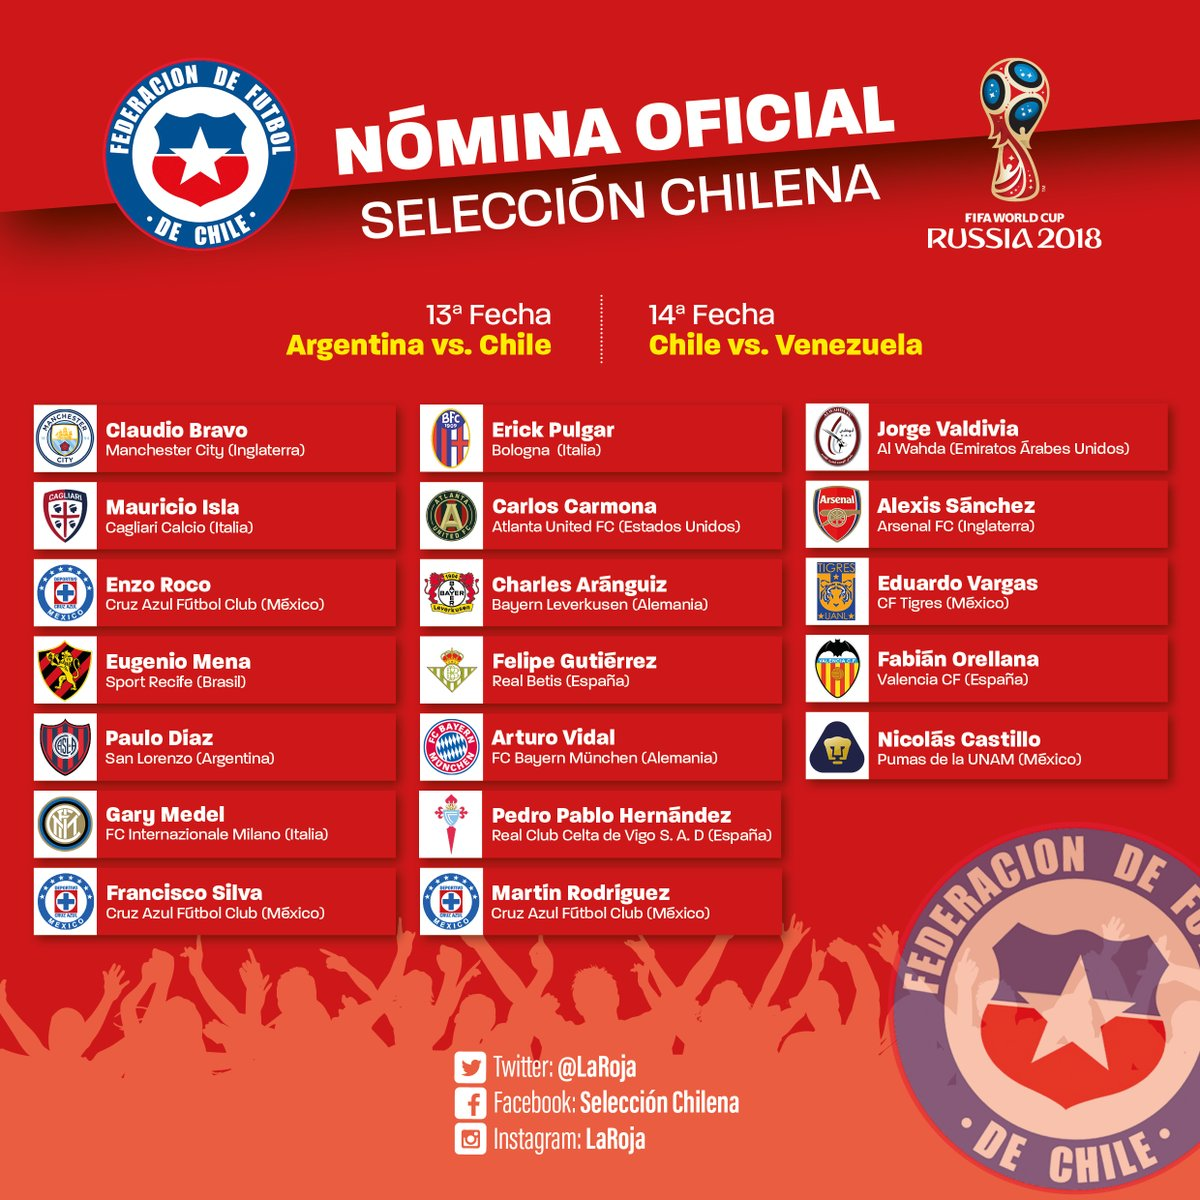 Nomina_extranjeros_de_Chile_marzo